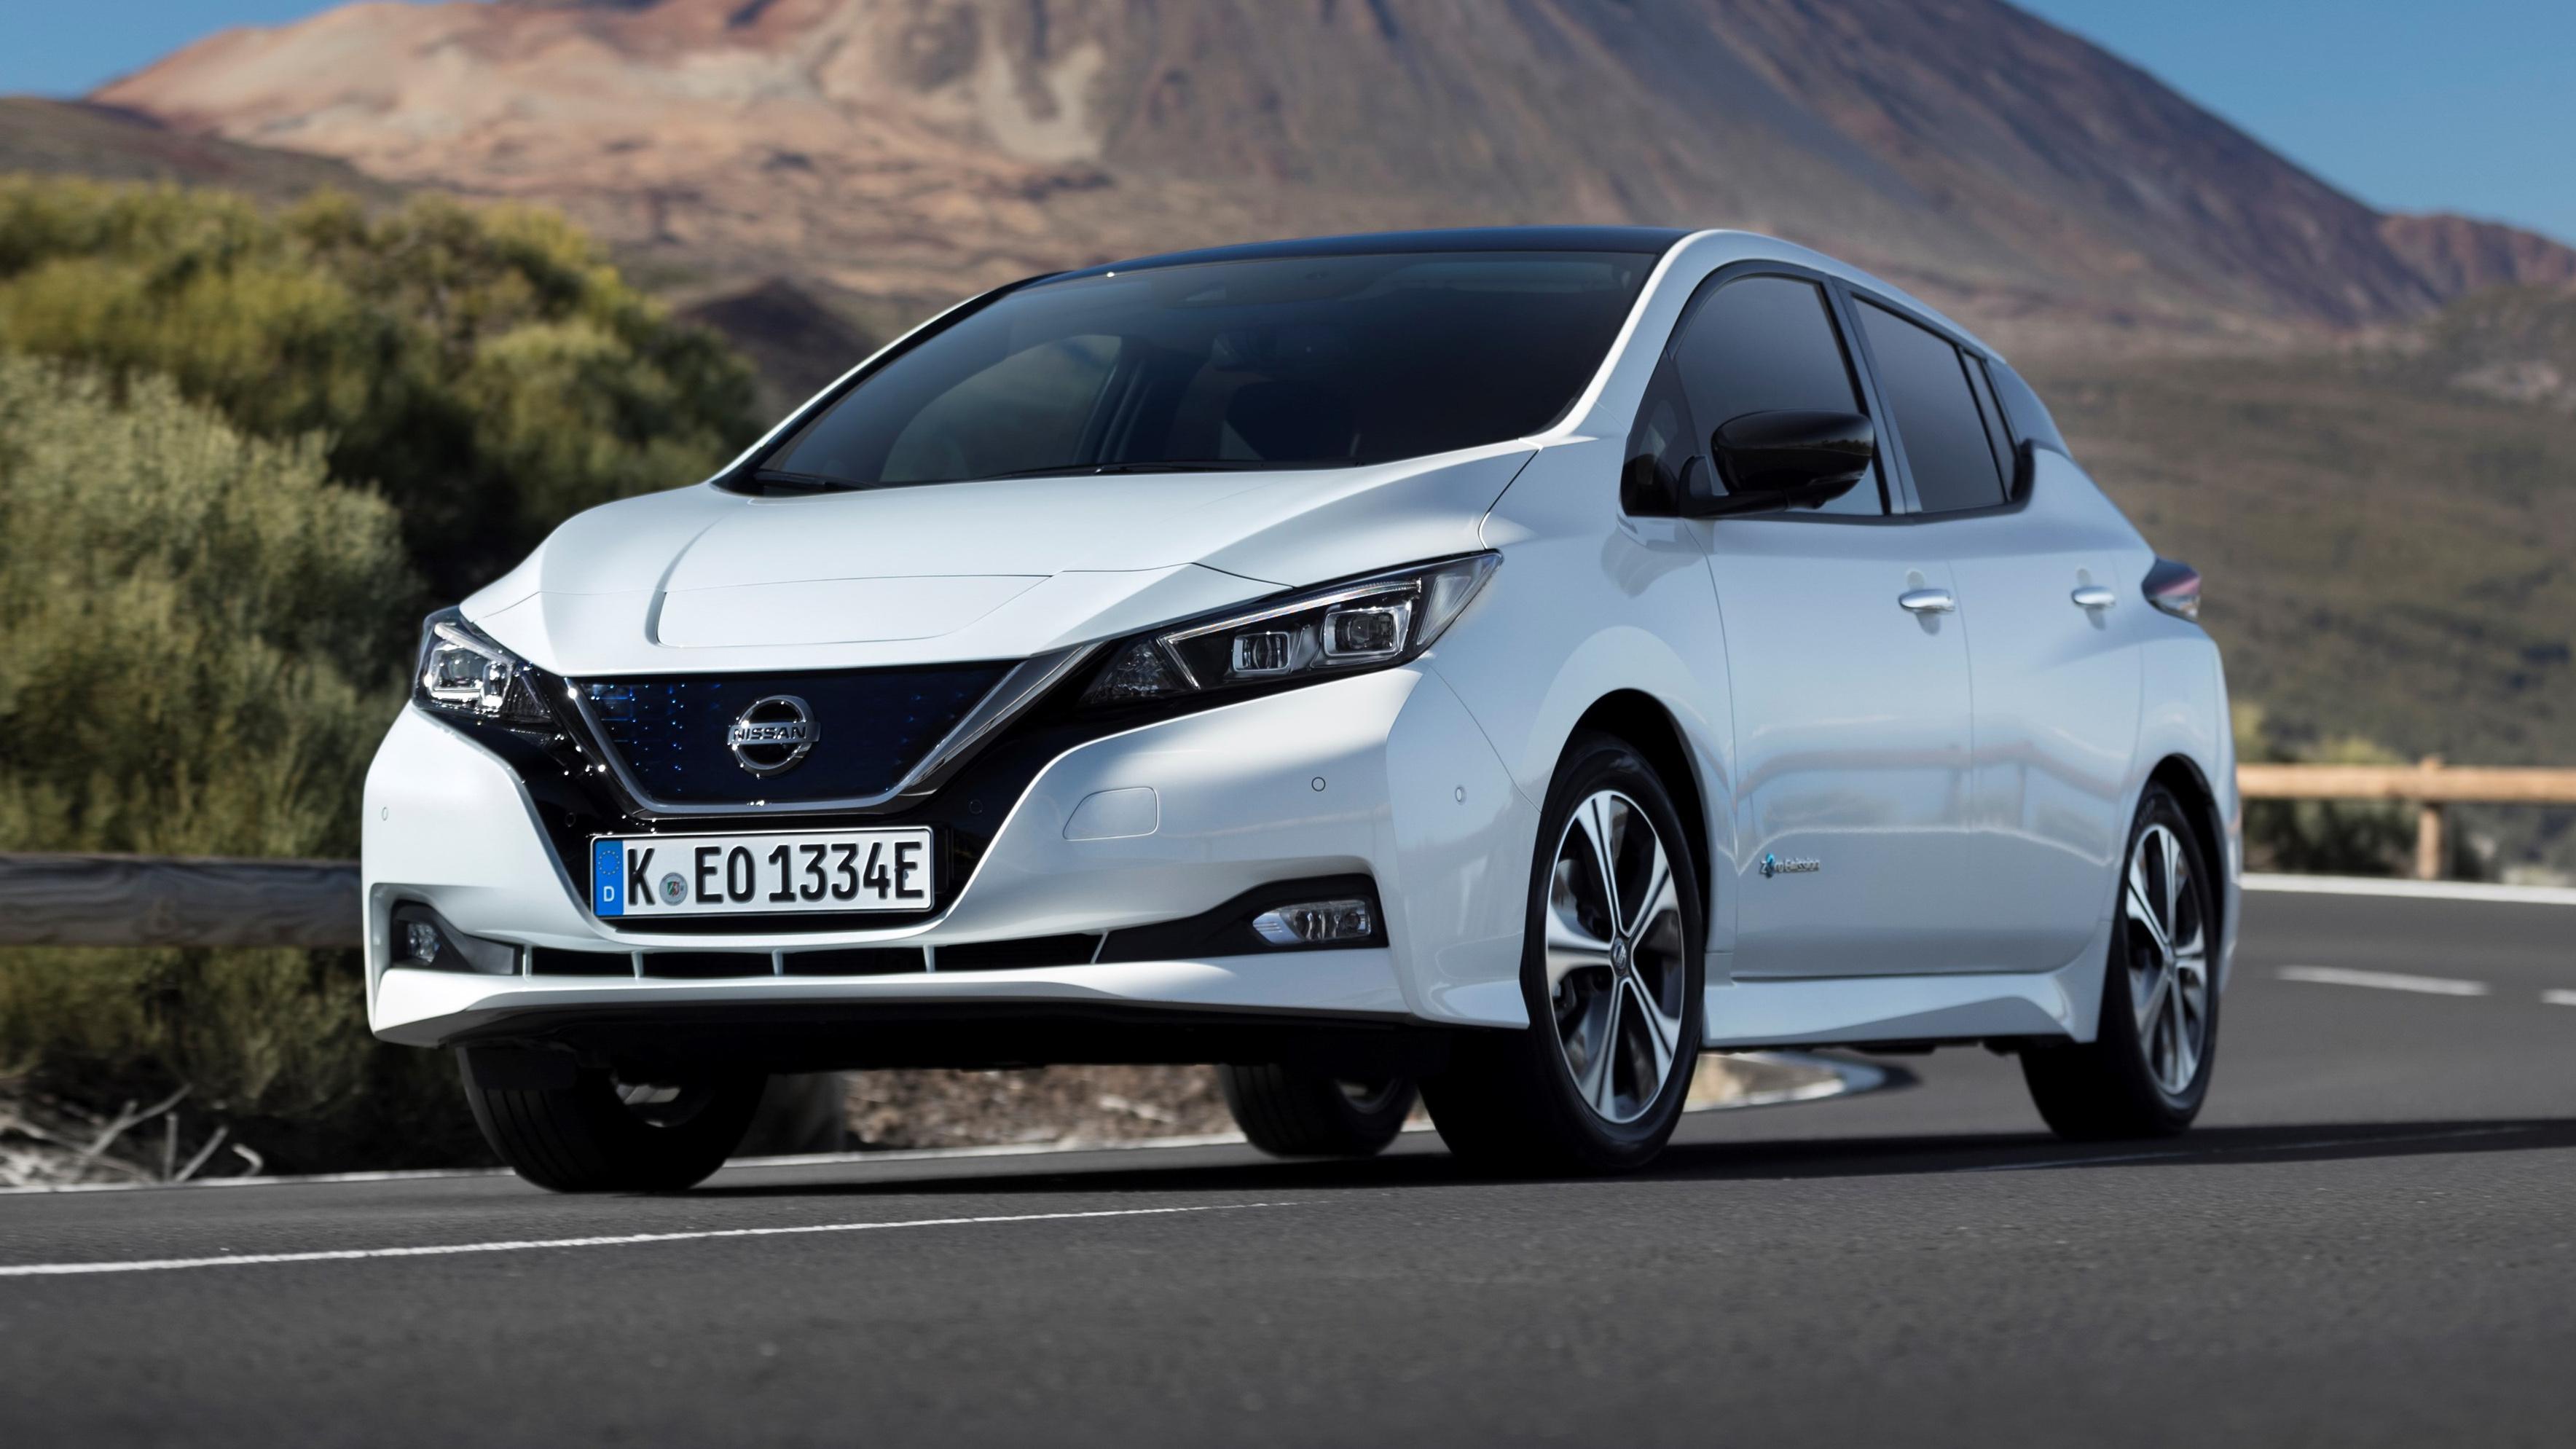 Nissan Leaf front three quarters